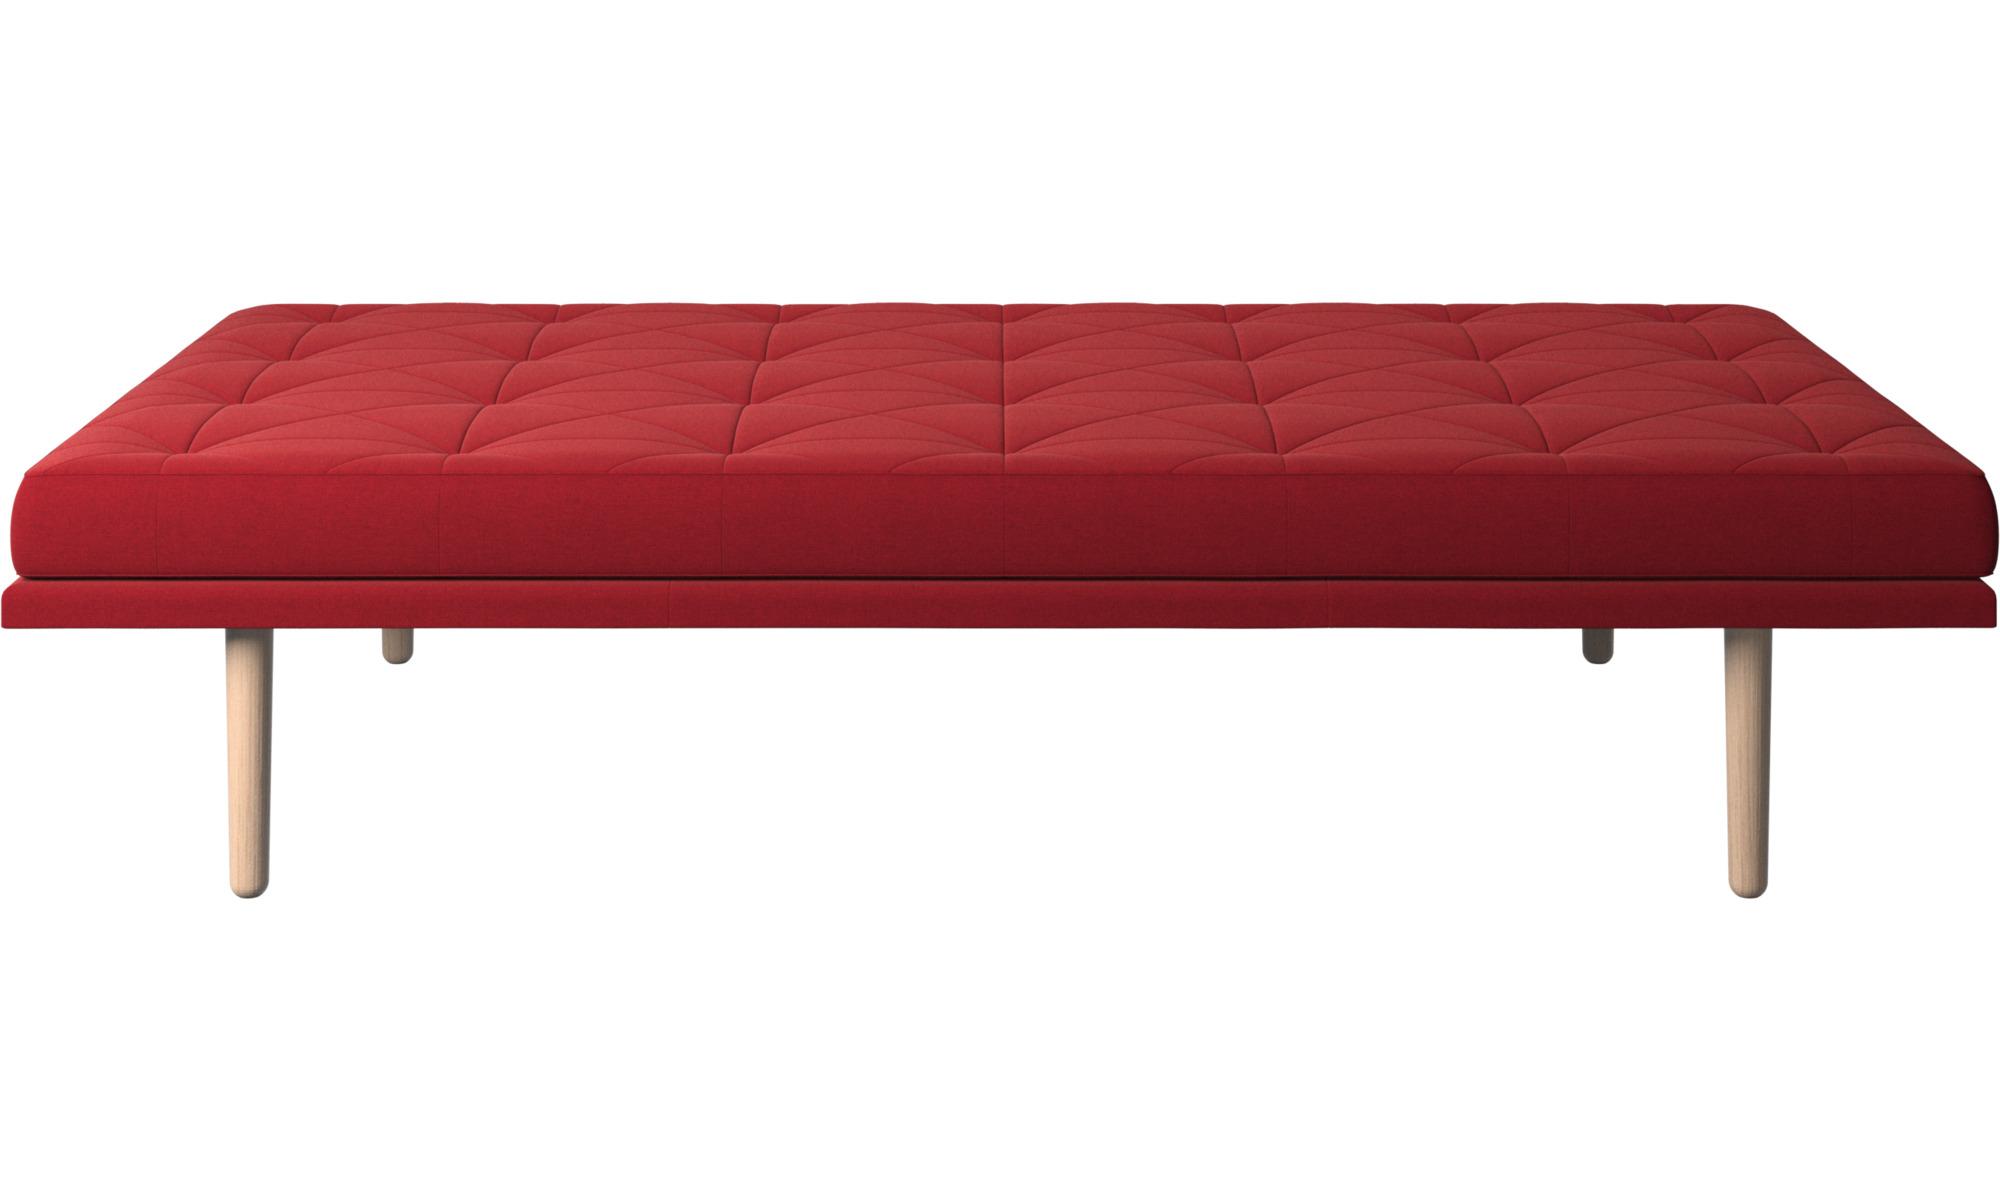 Divanes - Sofá-cama fusion - Rojo - Tela